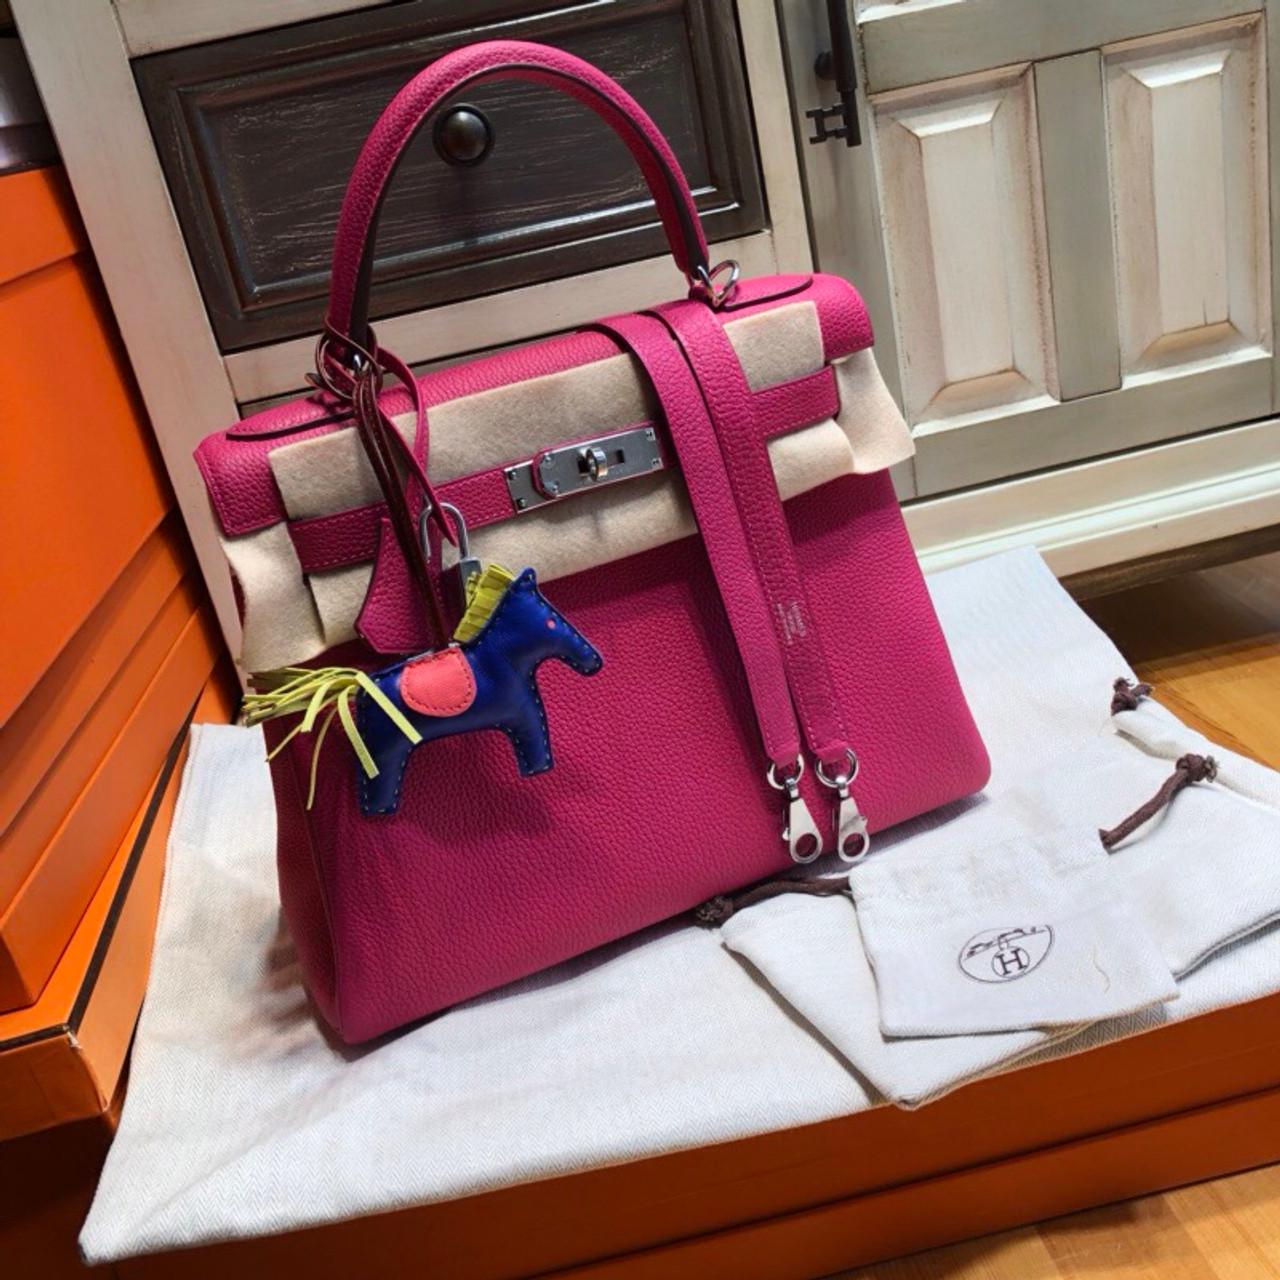 Hermès 80 Gris Perle Birkin 35 Togo Leather Gold Hardware  64d2c230e7269